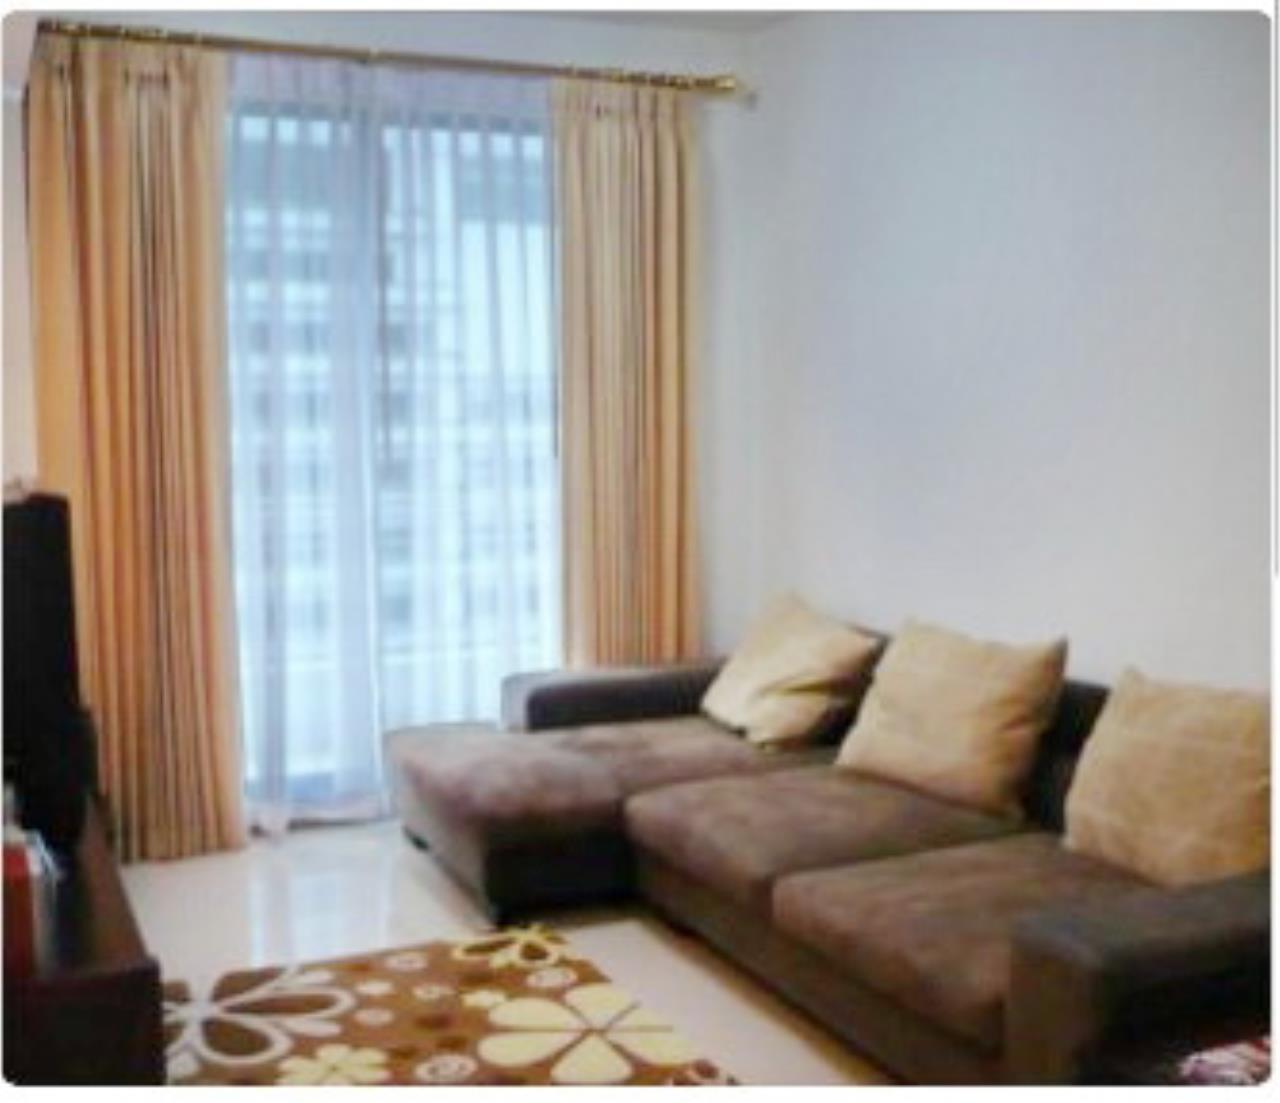 Agent - Mayteekul Sujirapinyokul Agency's AC6180418 For Rent Condo Supalai Premier Place Asoke Condo MRT Phetchaburi 3